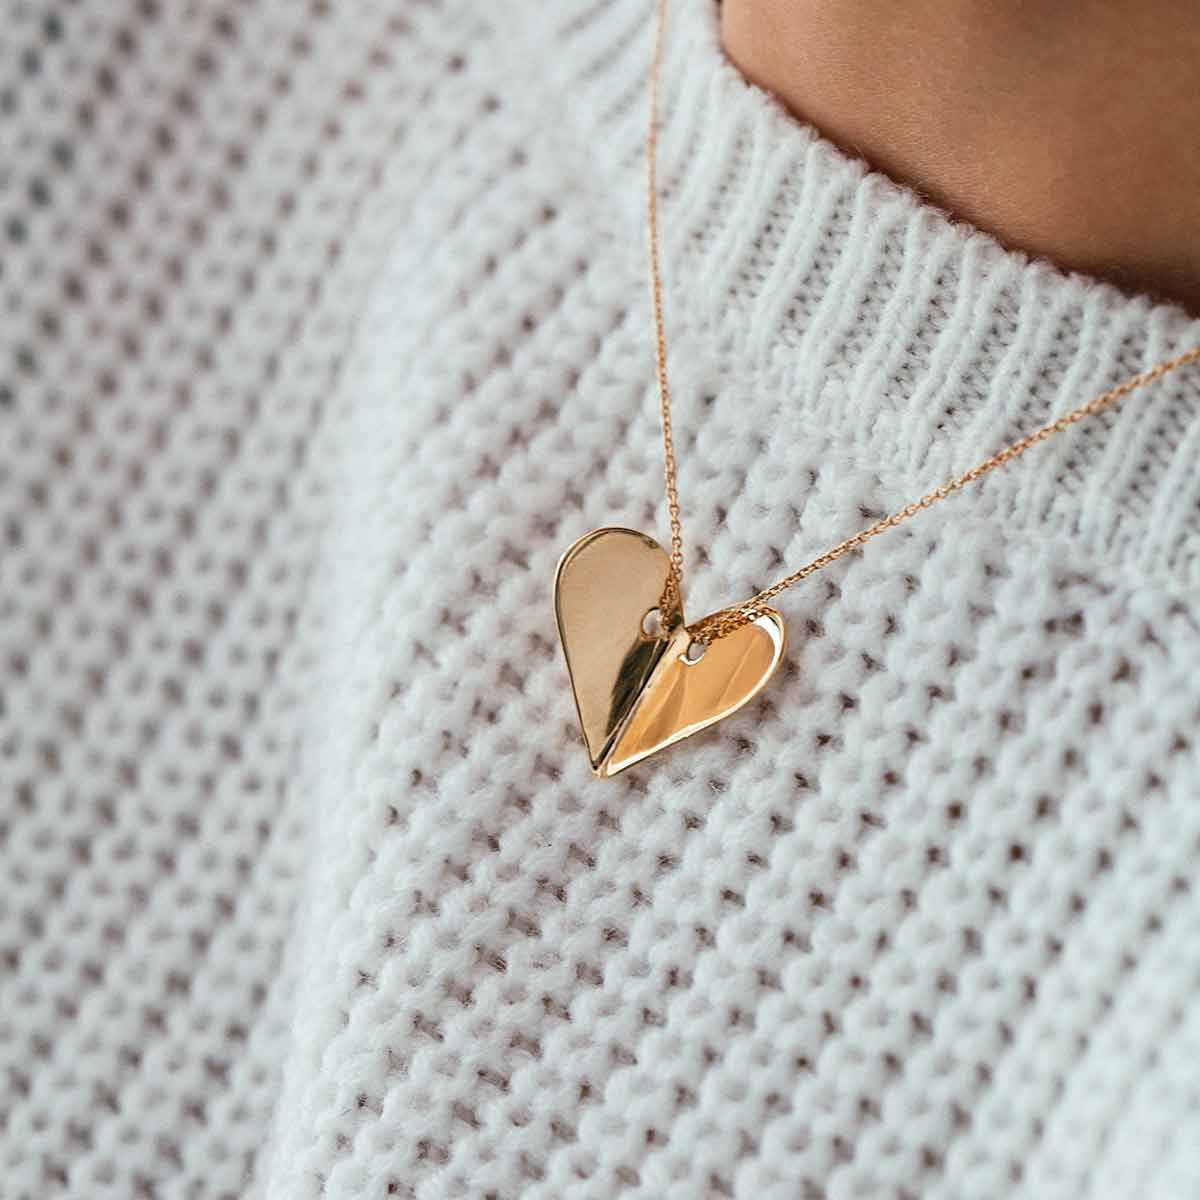 گردنبند طلا قلب پرسته